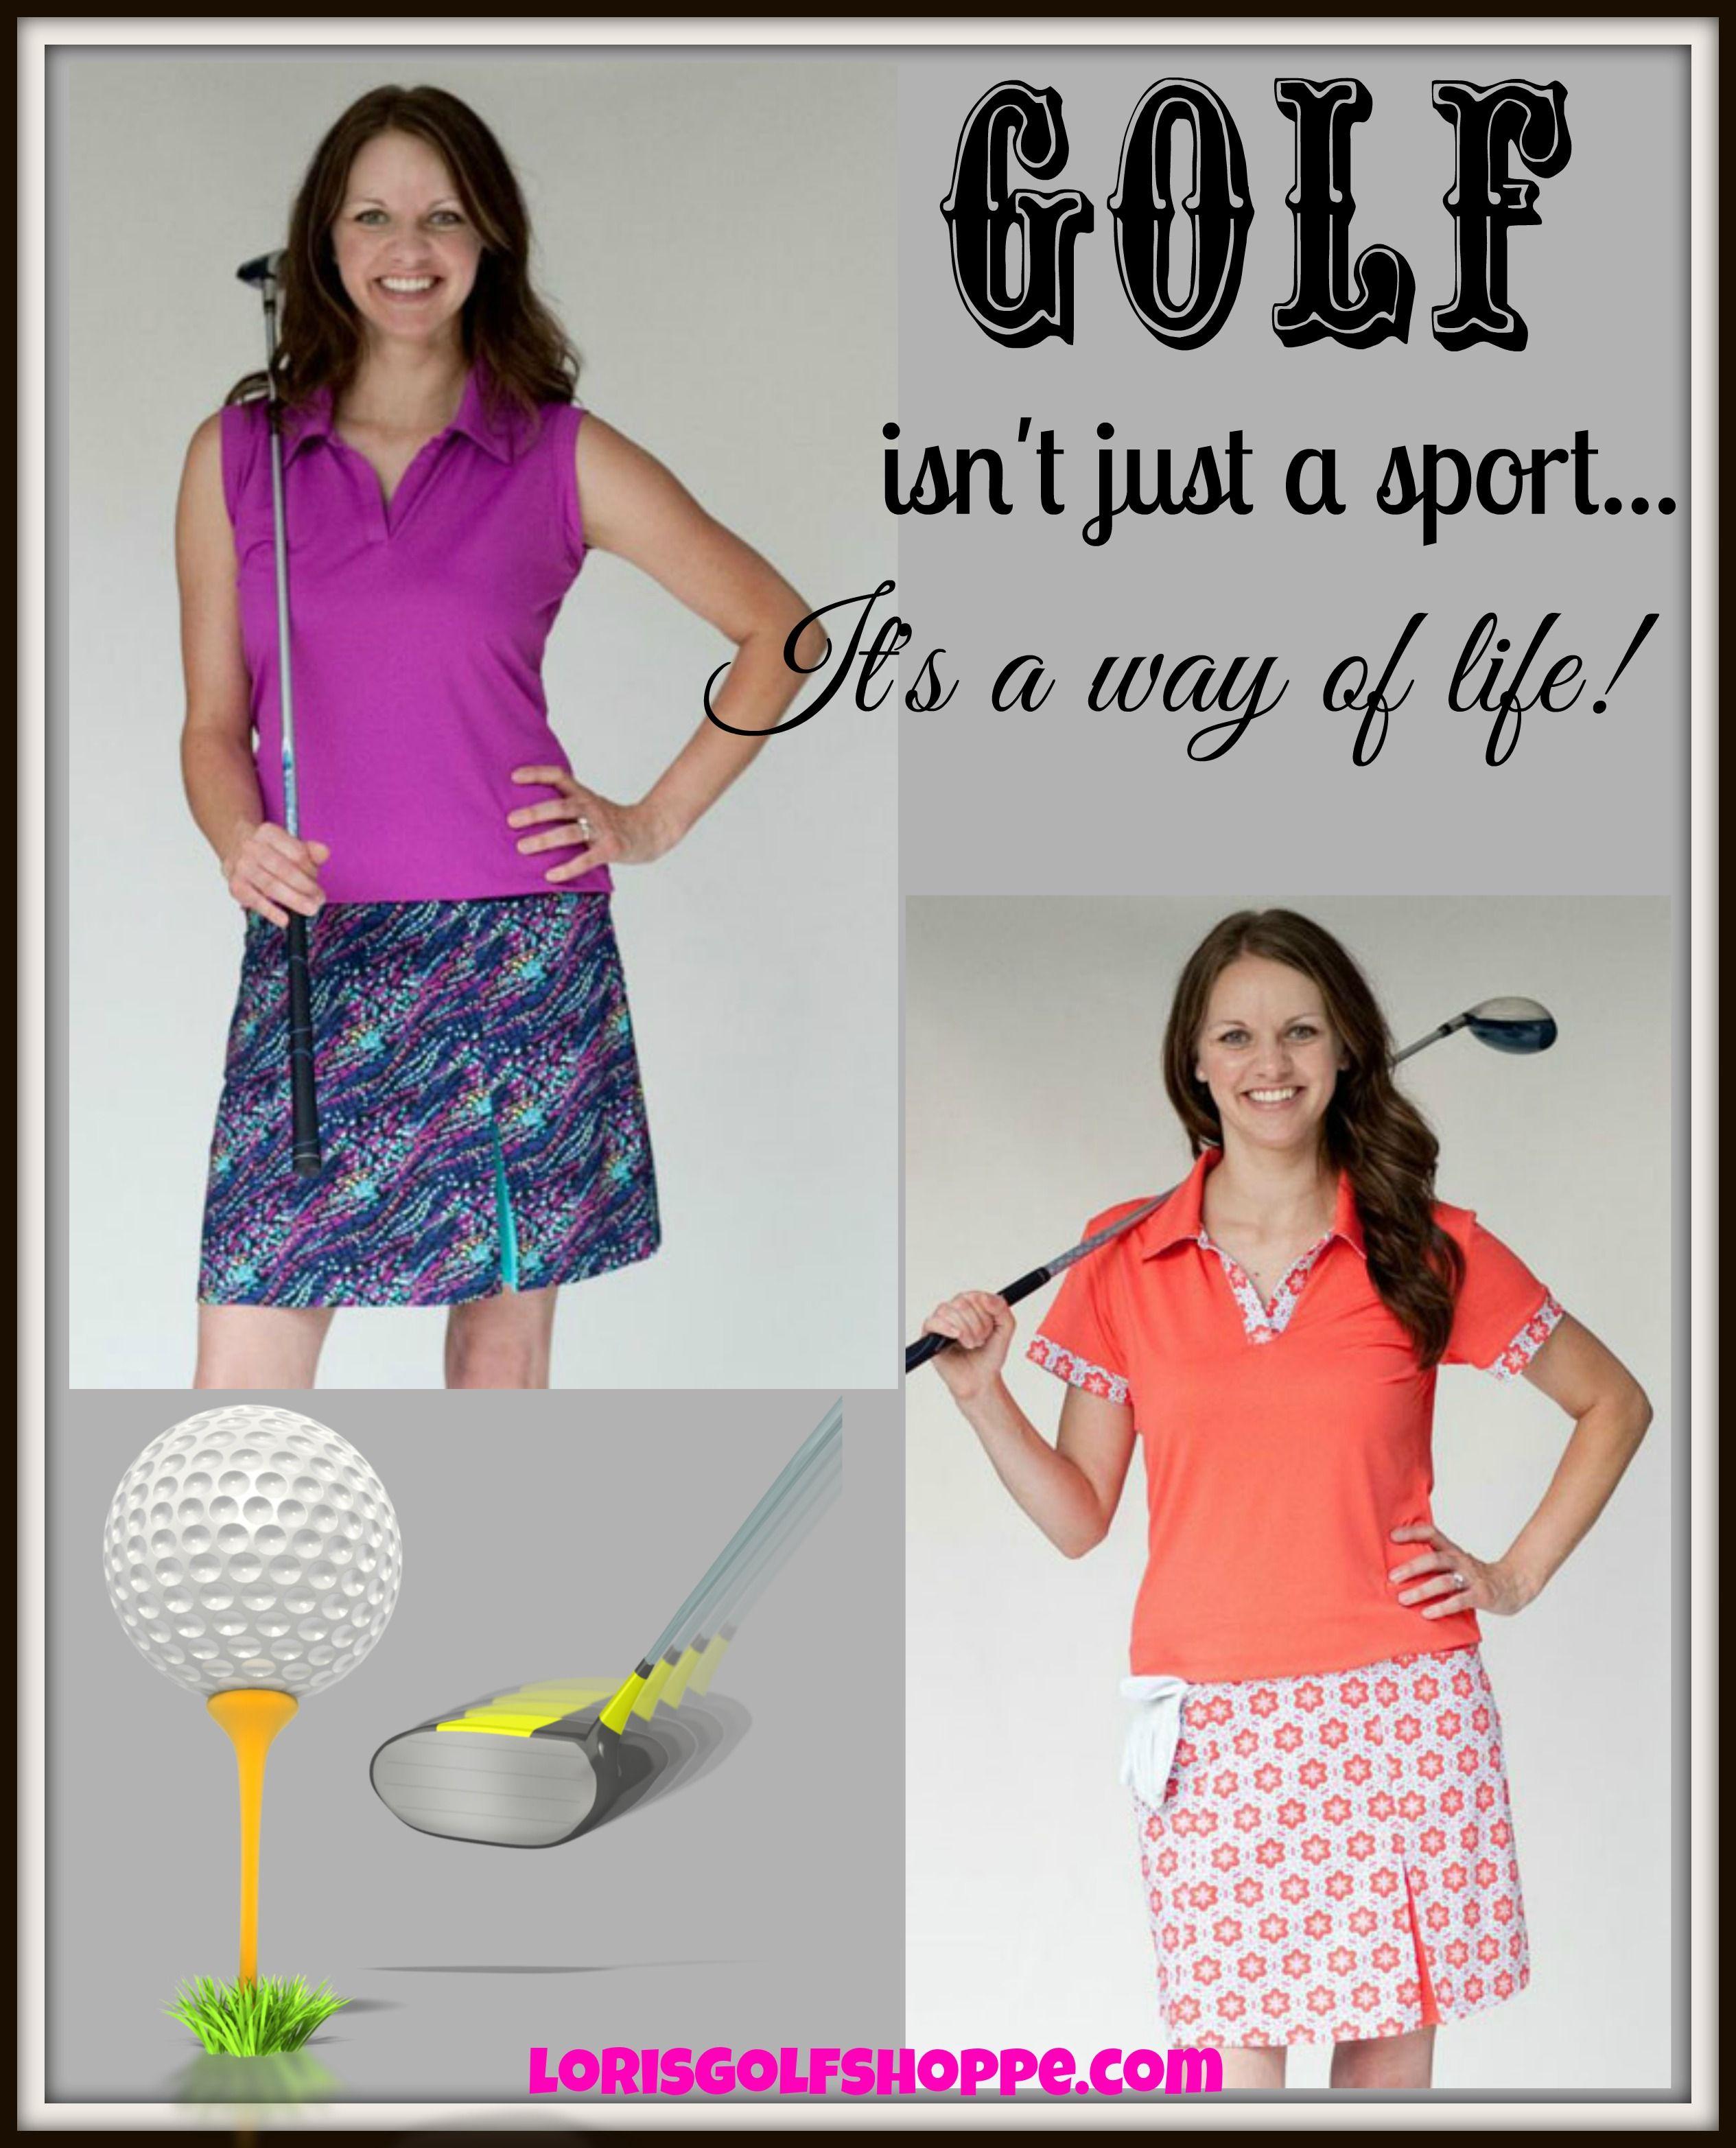 21+ Lories golf information